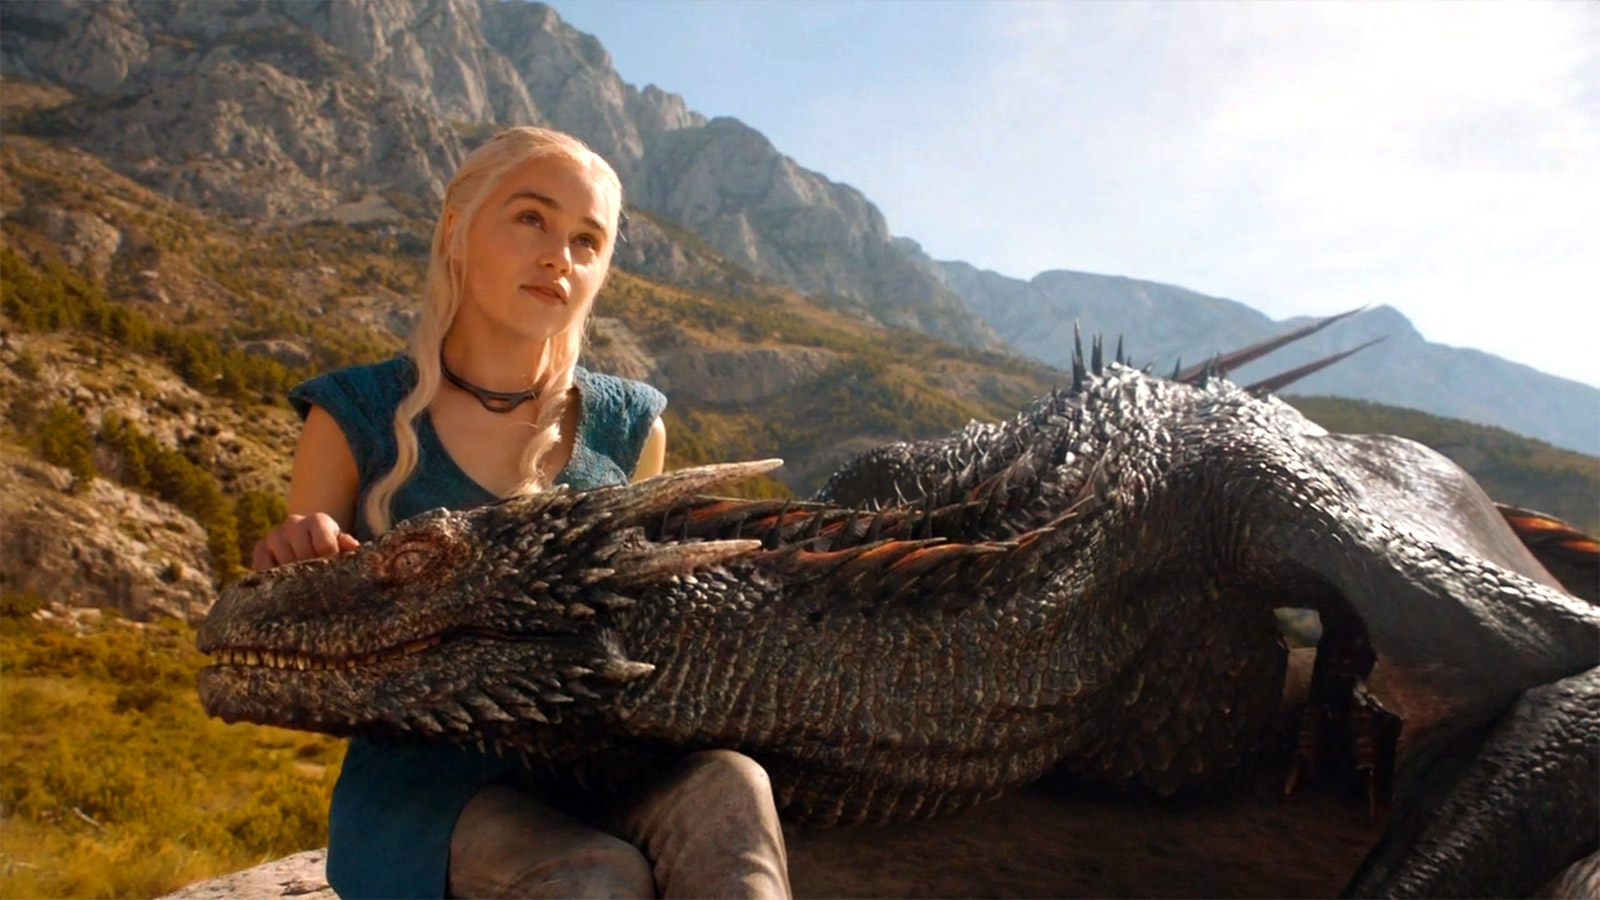 Daenerys-Targaryen-And-Dragon